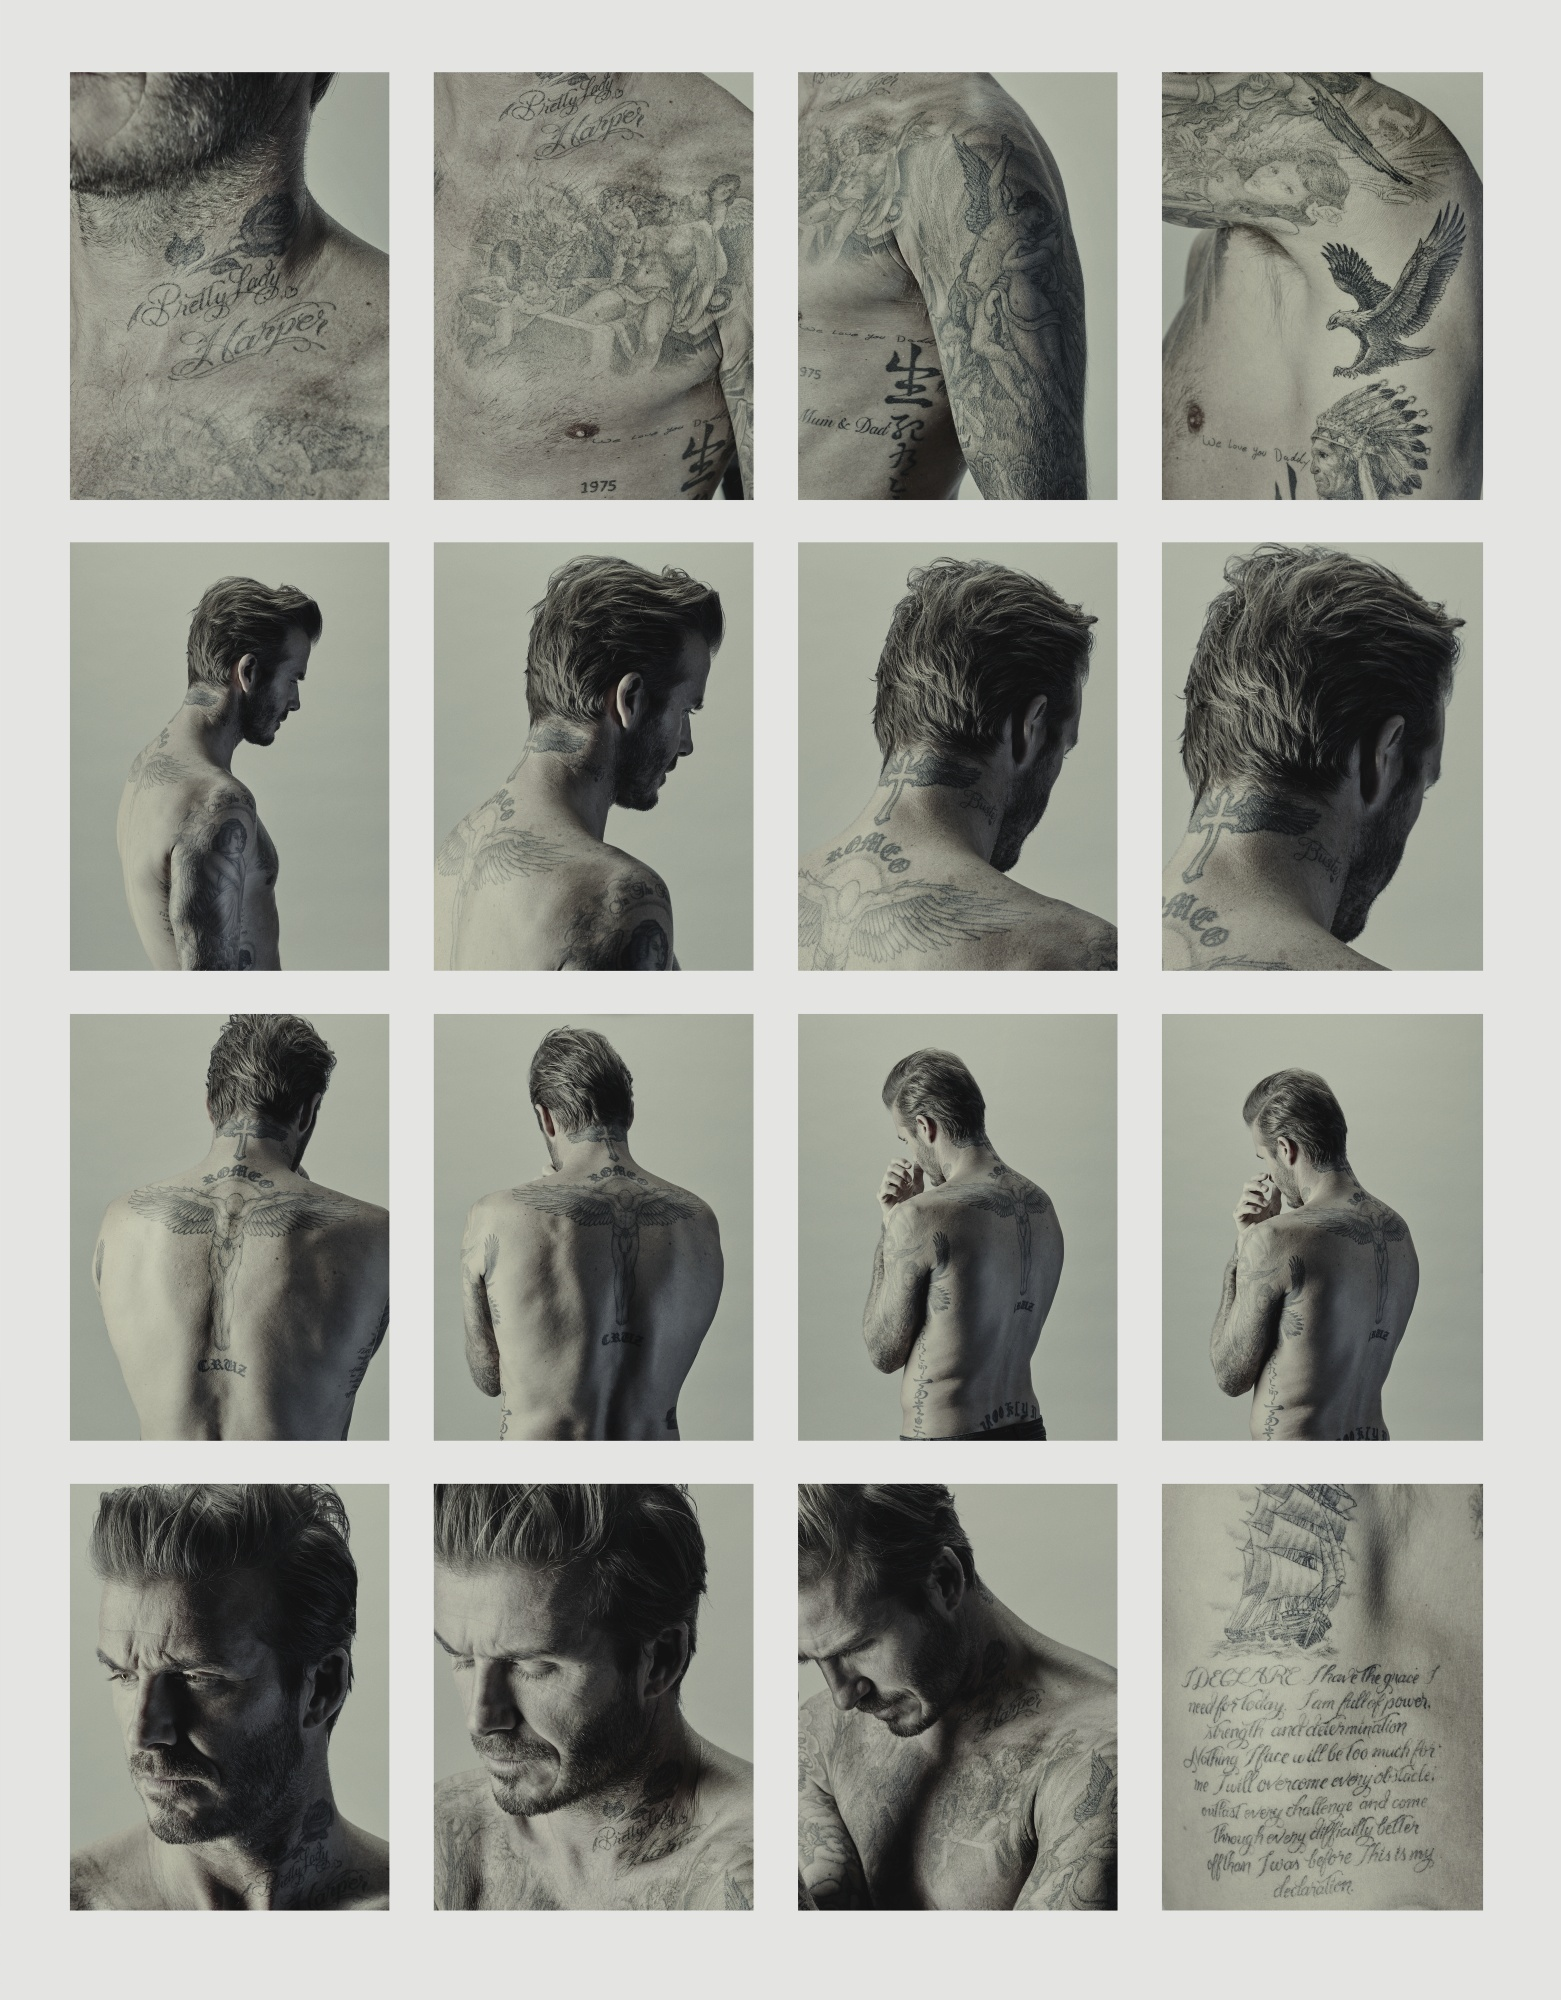 Nadav Kander-David Beckham 16 Pictures From David Beckham's Ink 2015-